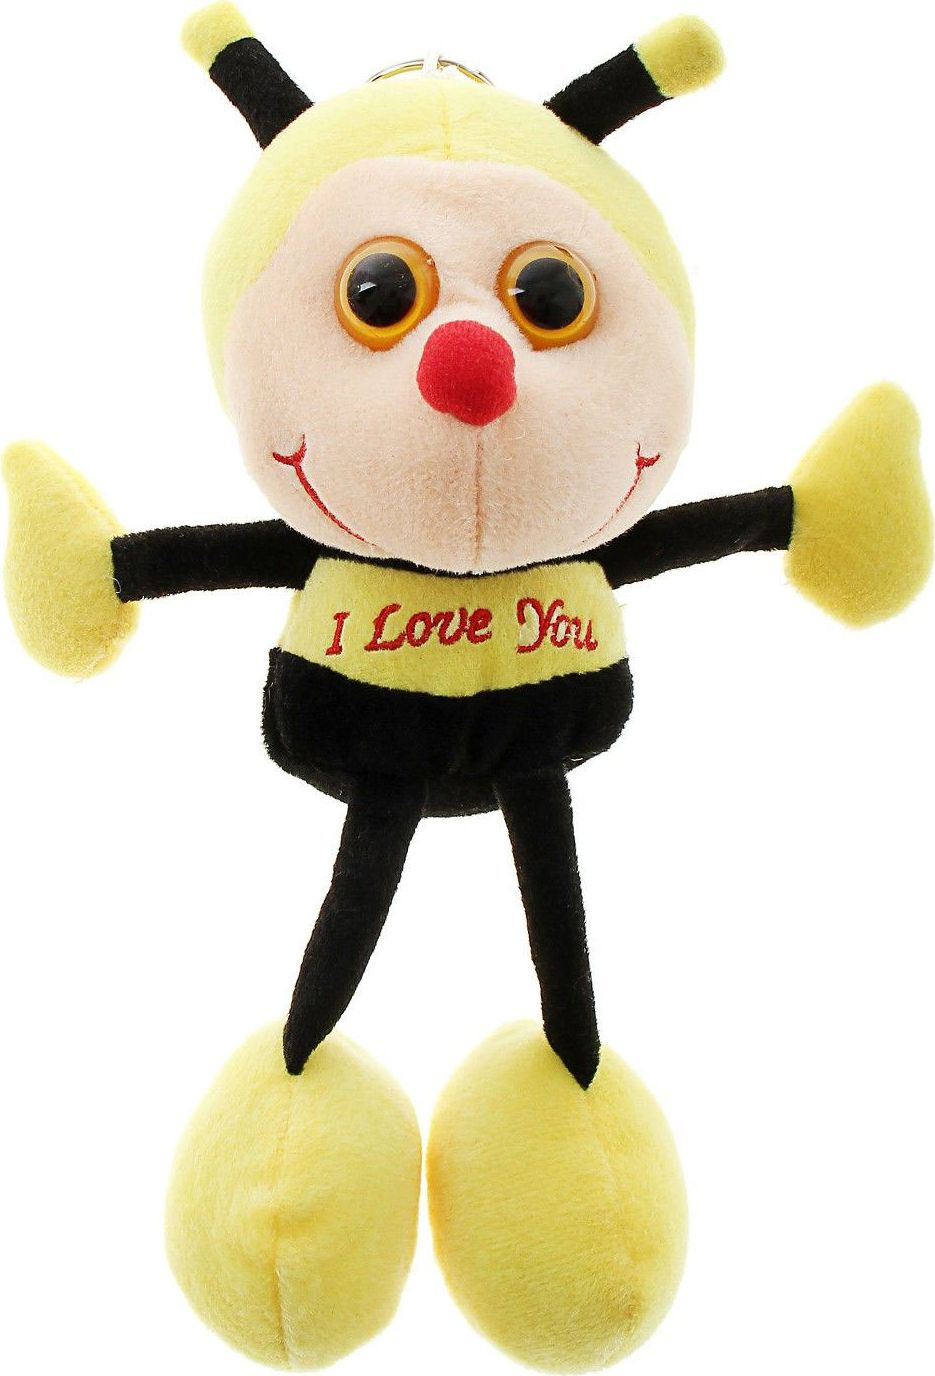 Sima-land Мягкая игрушка Пчелка с вышивкой на груди sima land мягкая игрушка на руку мальчик 1147835